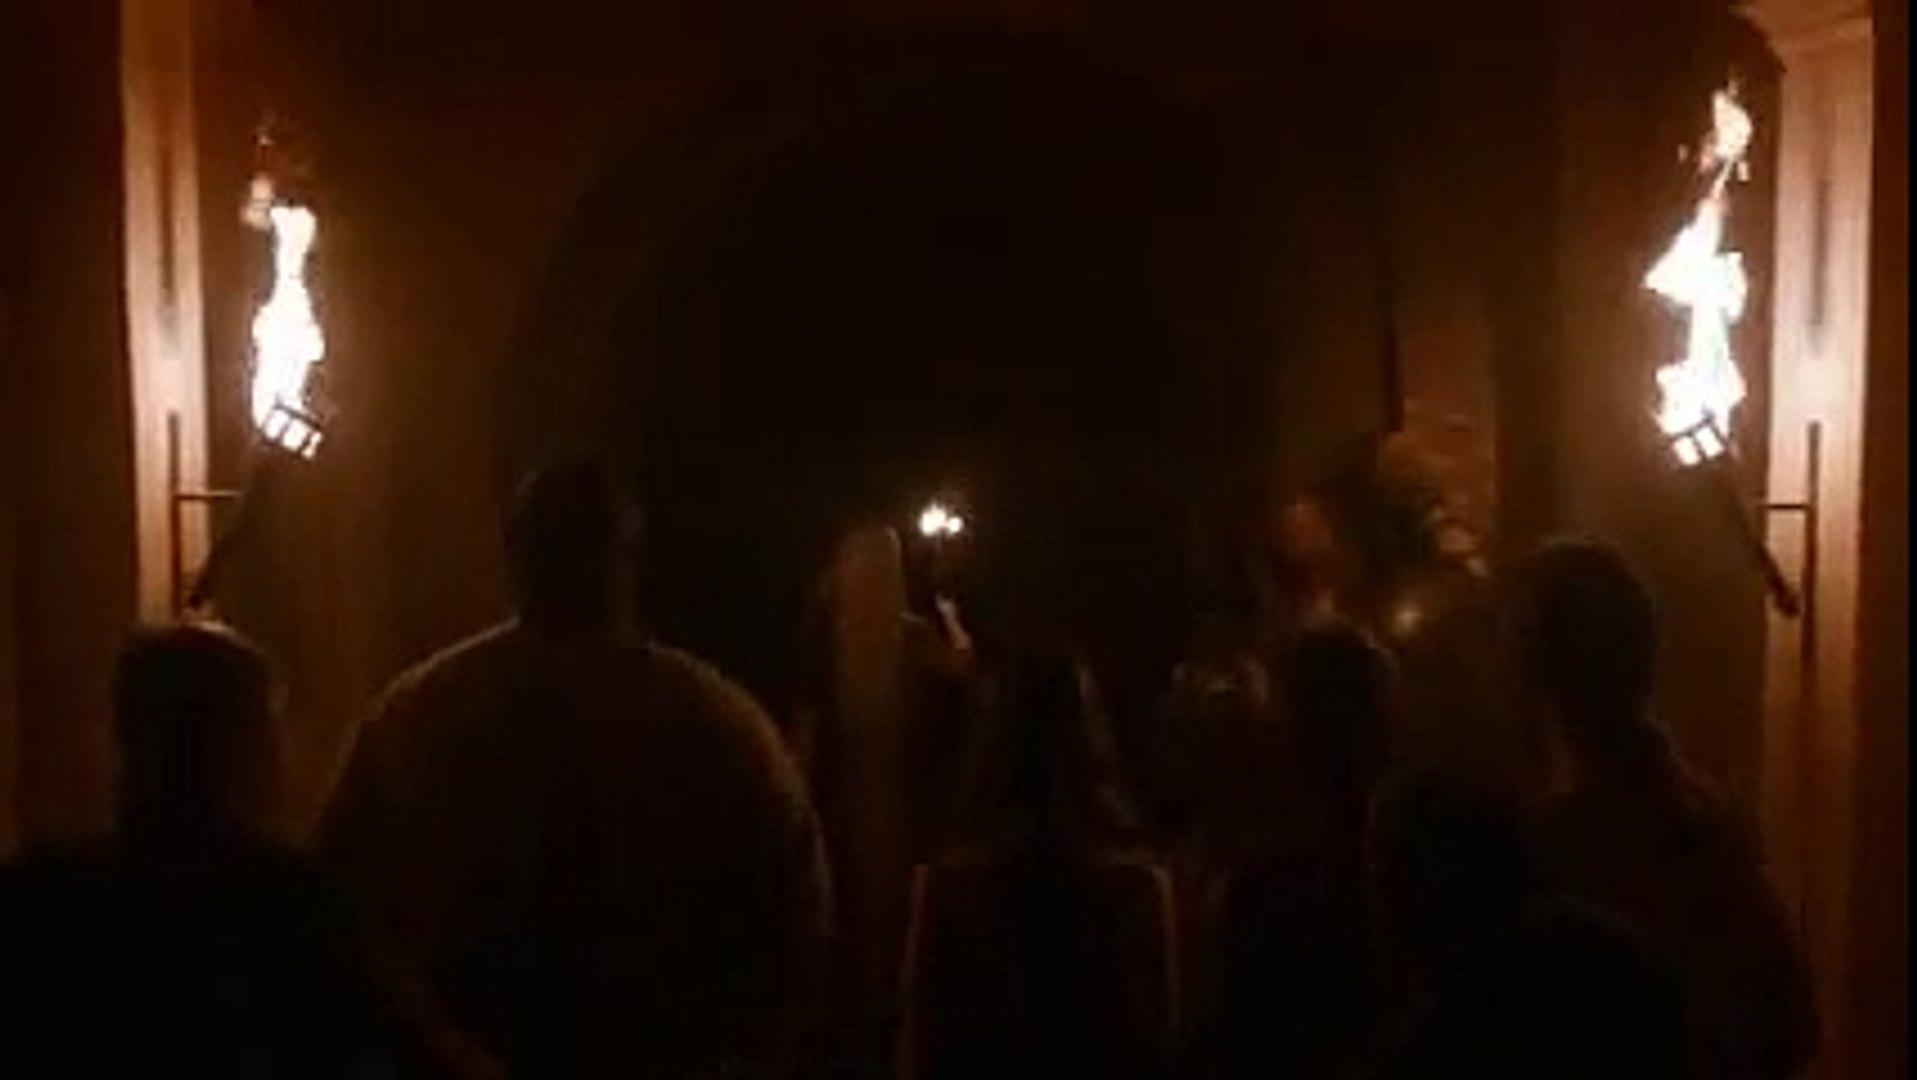 Daenerys locks Xaro Xhoan Daxos & Doreah - video Dailymotion